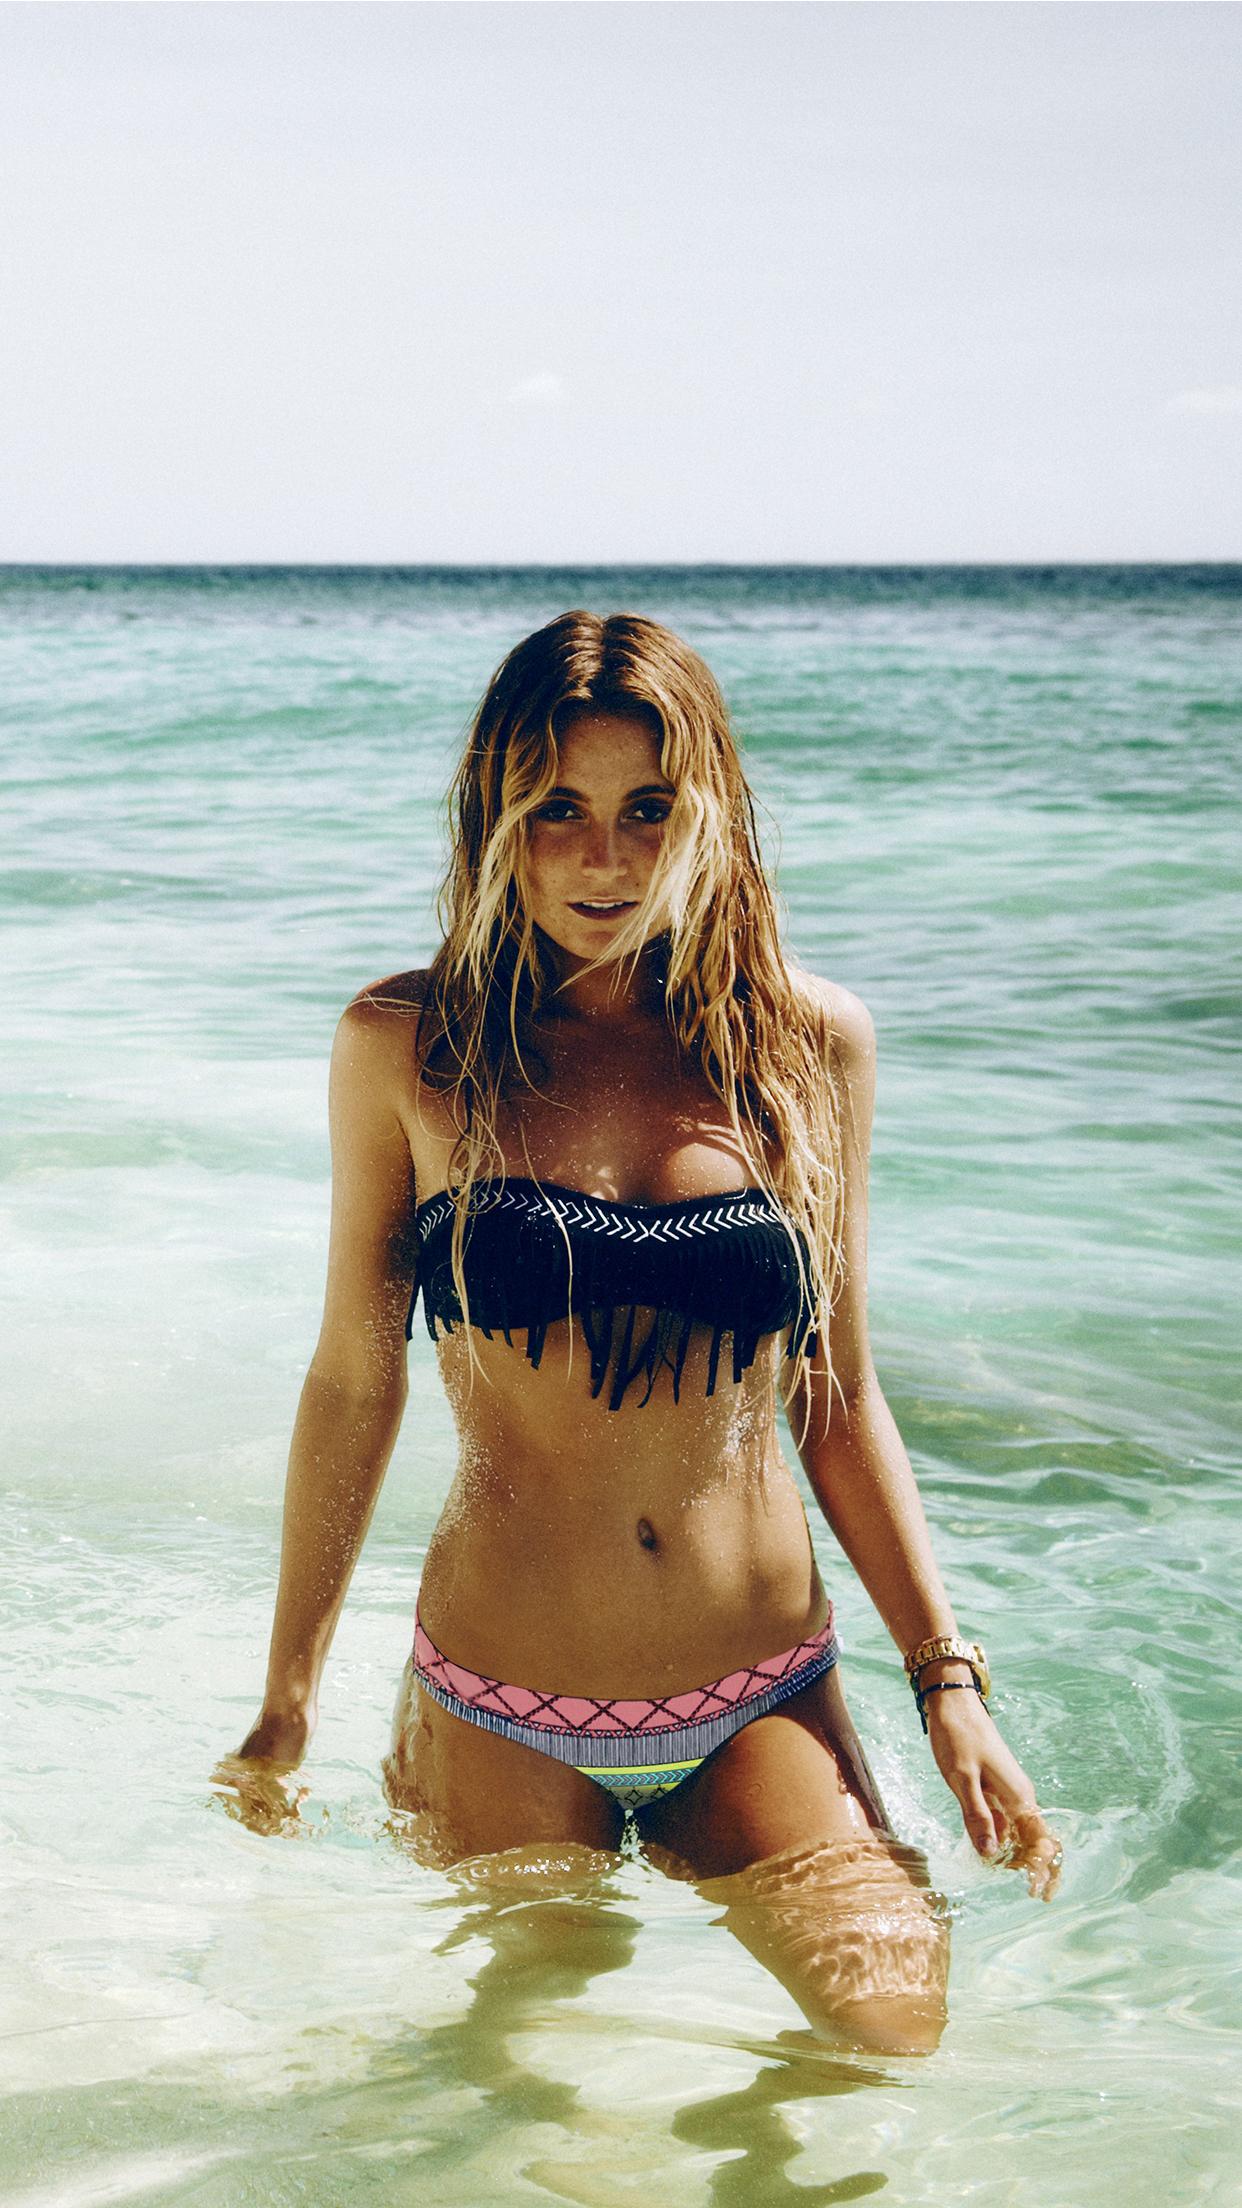 Instagram Dua Lipa nude (65 photos), Tits, Sideboobs, Selfie, swimsuit 2020